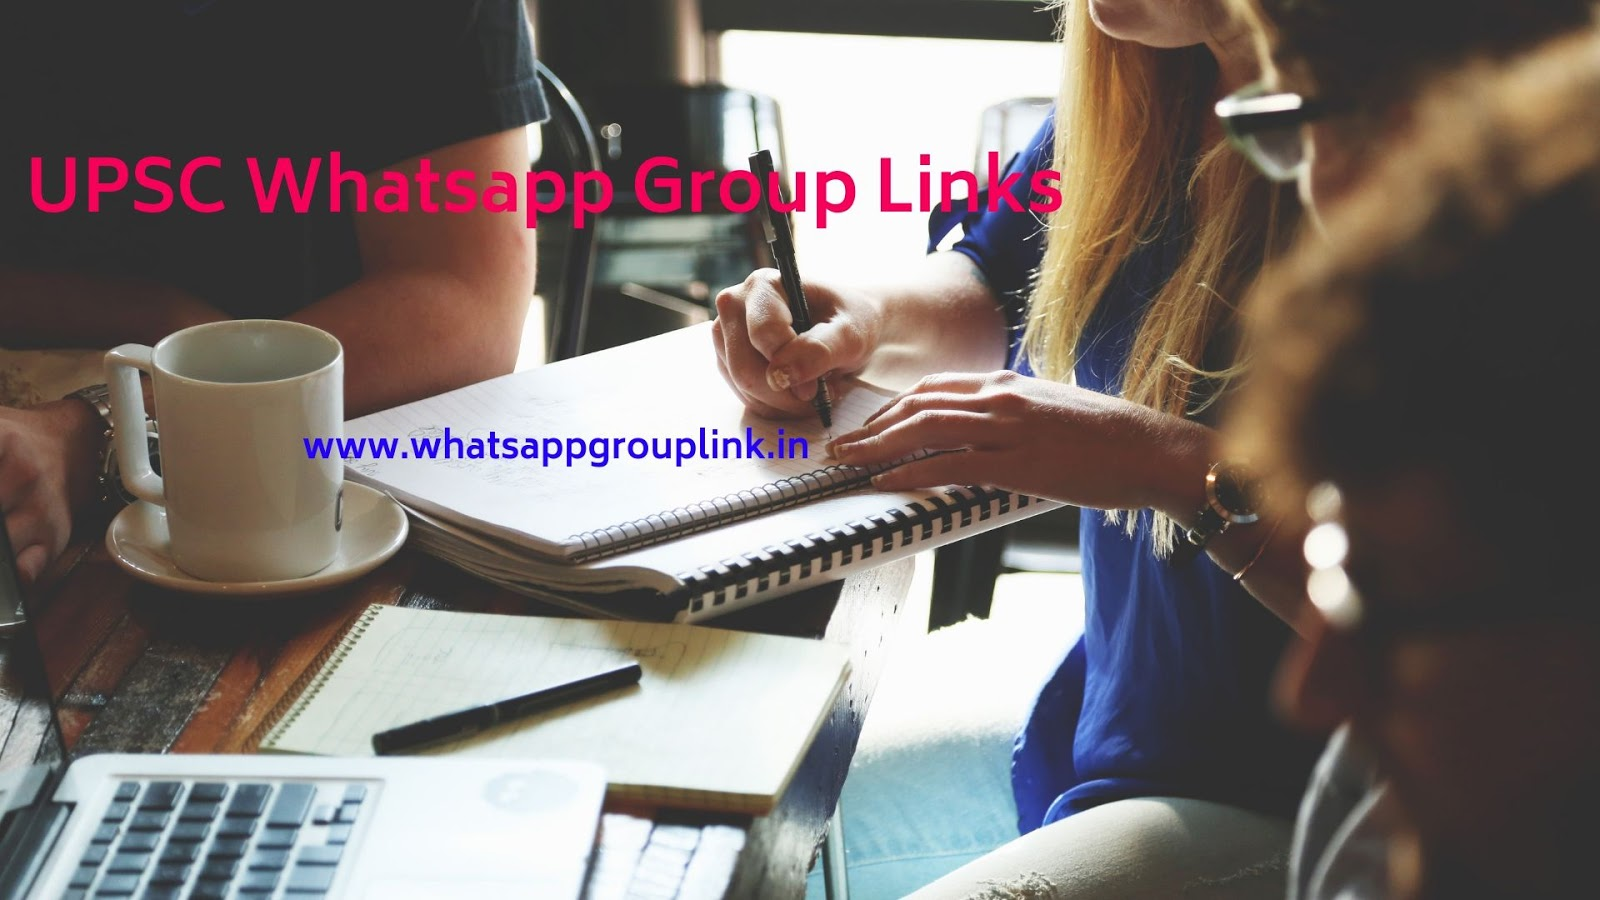 Whatsapp Group Link: UPSC Whatsapp Group Links